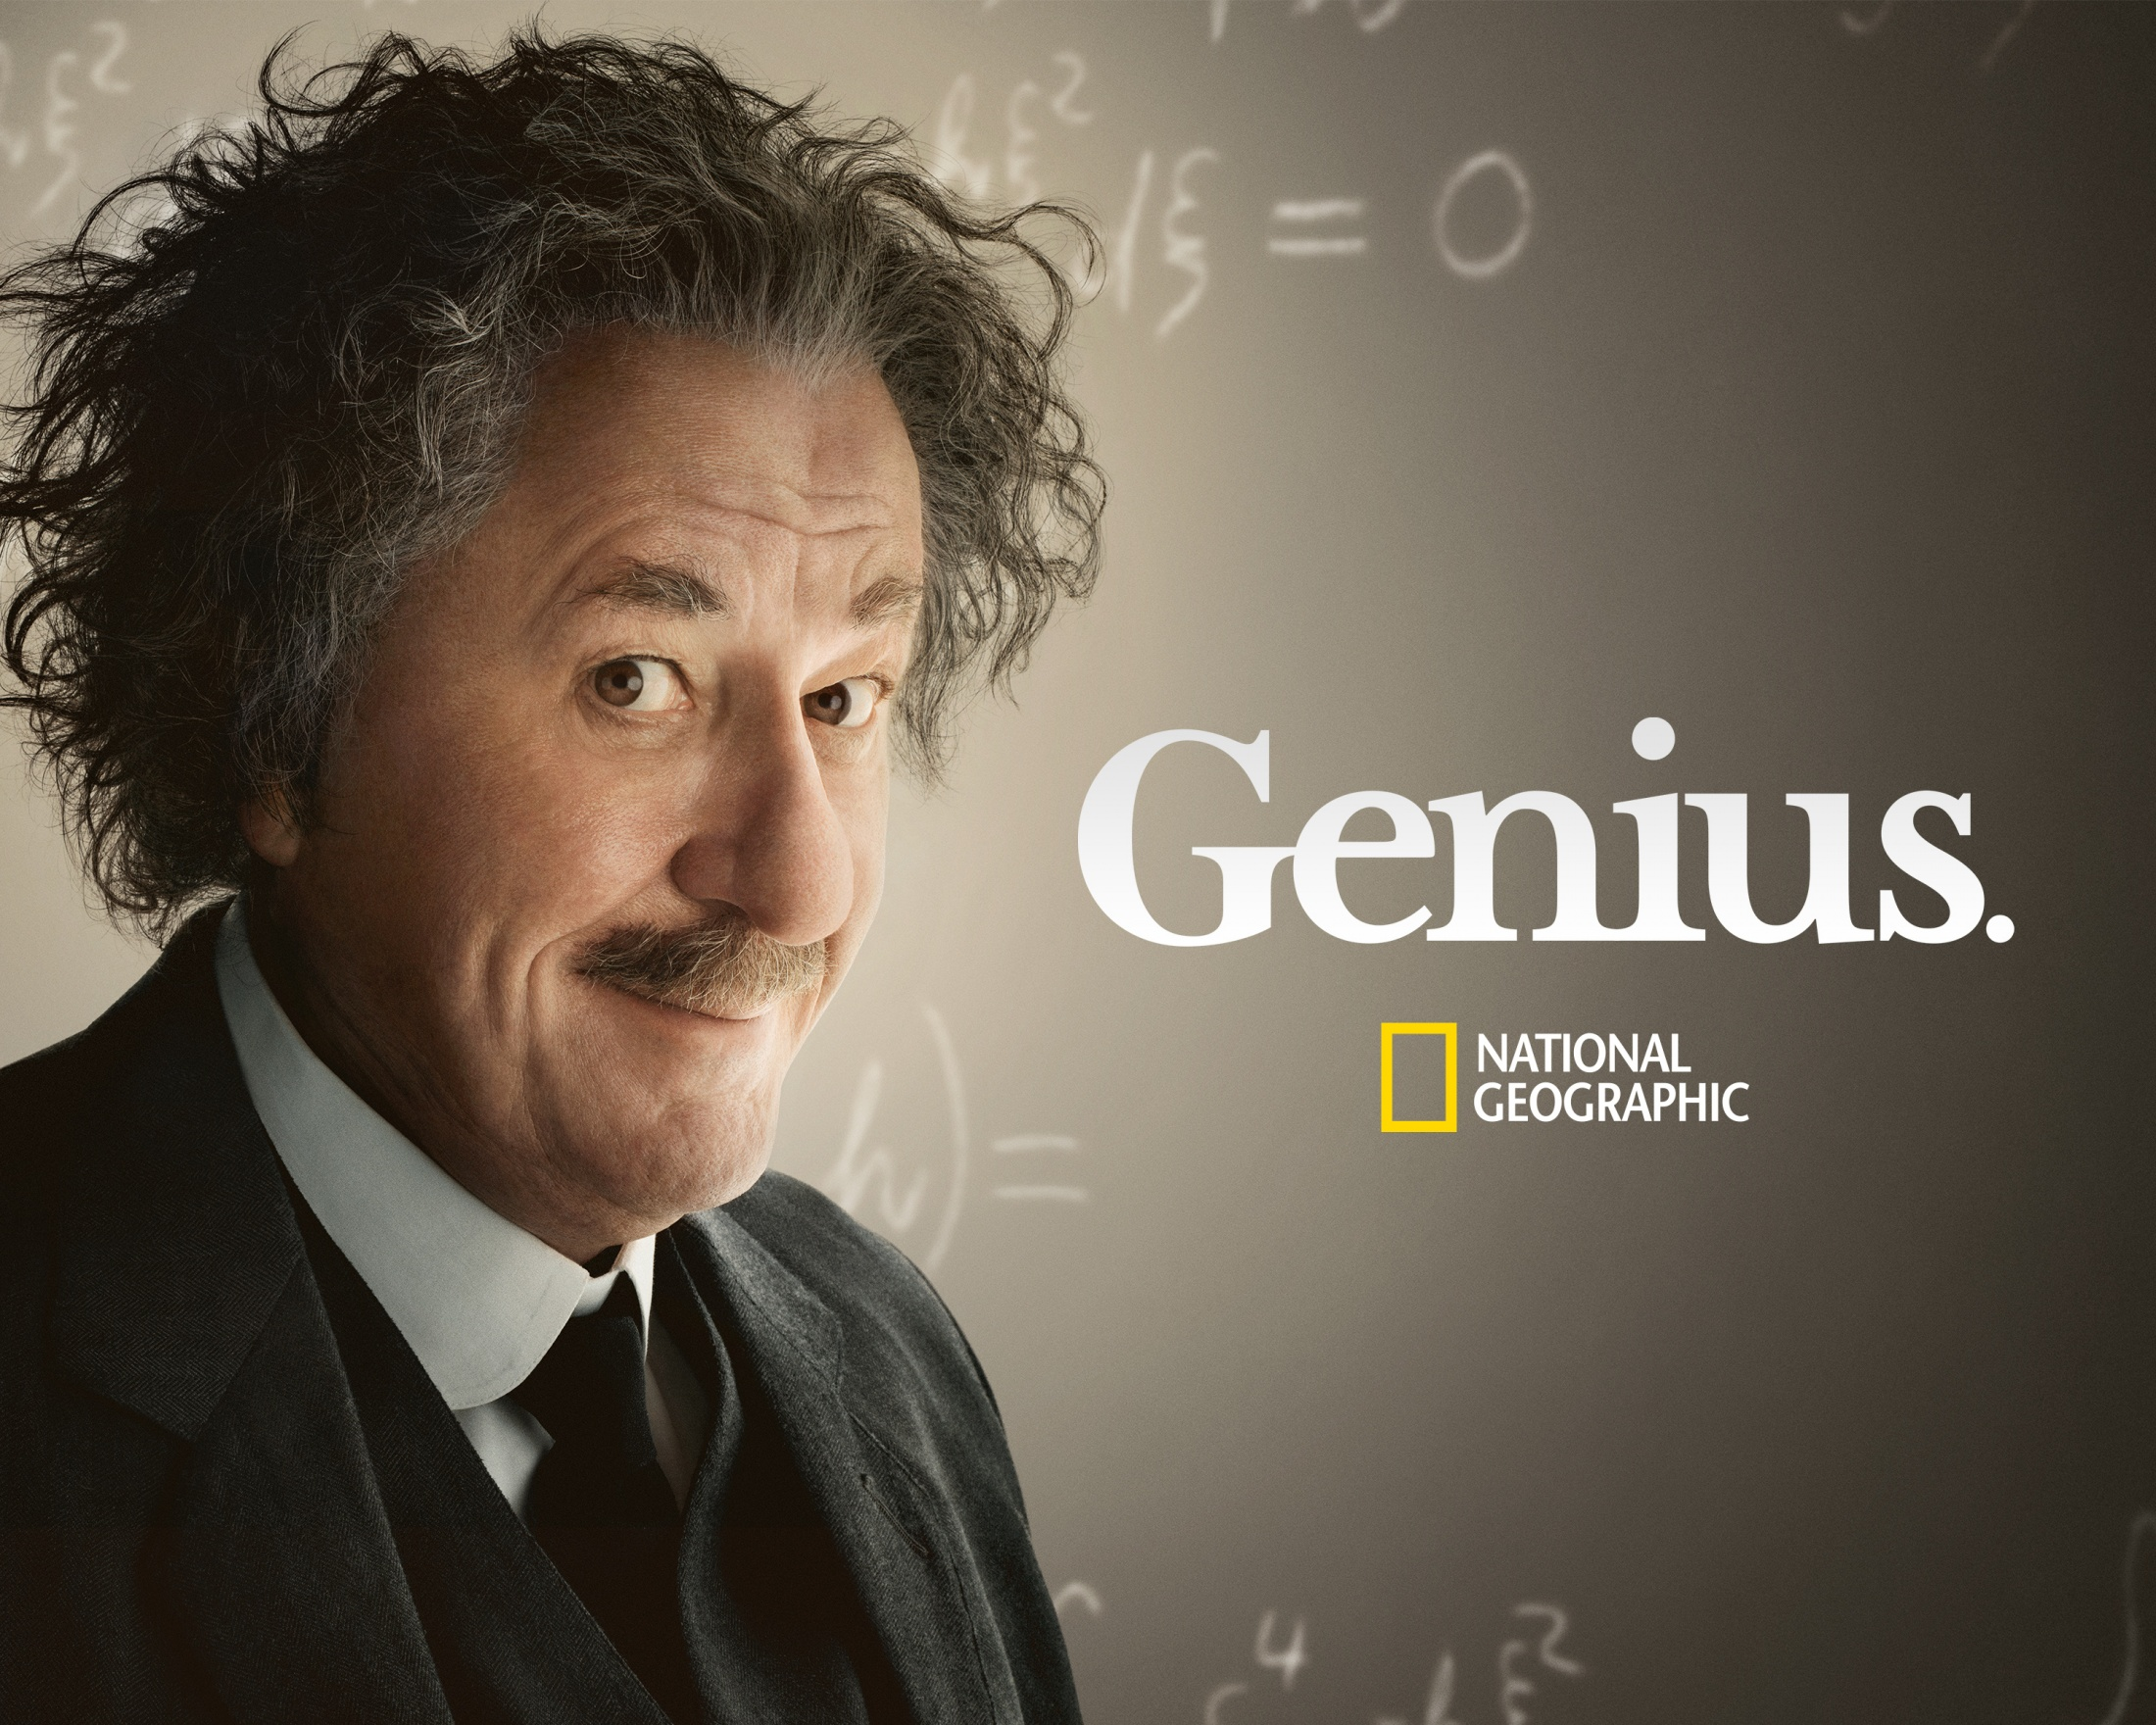 Thumbnail for Genius